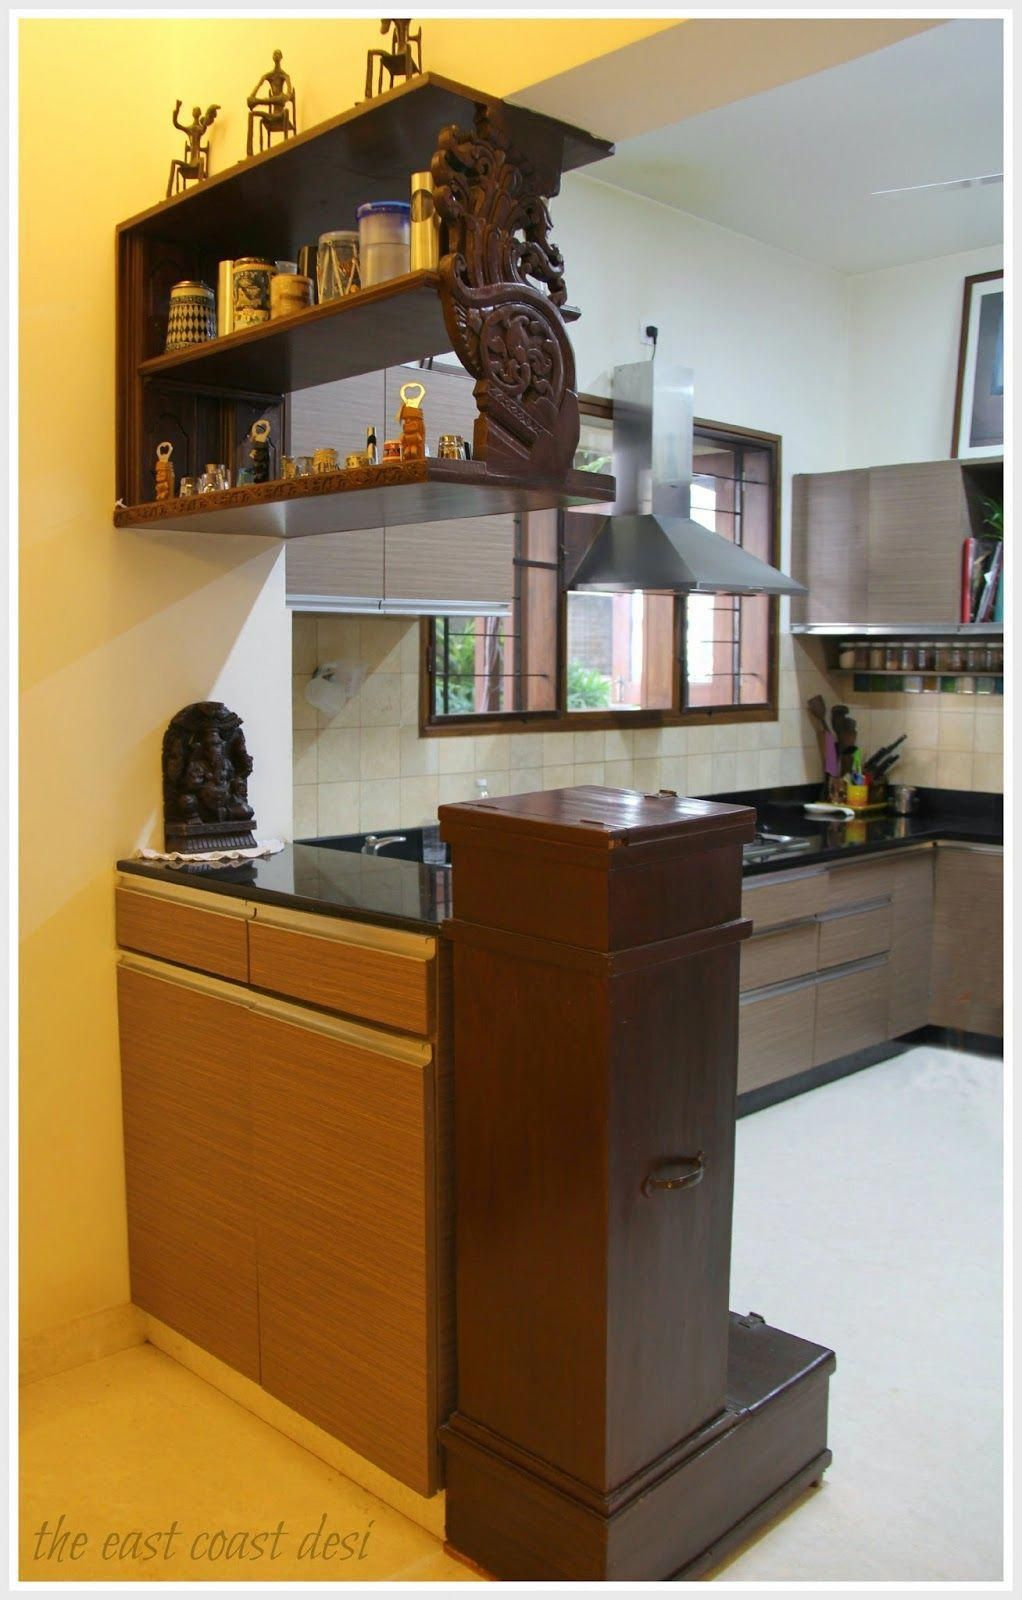 More ideas below KitchenRemodel KitchenIdeas Indian